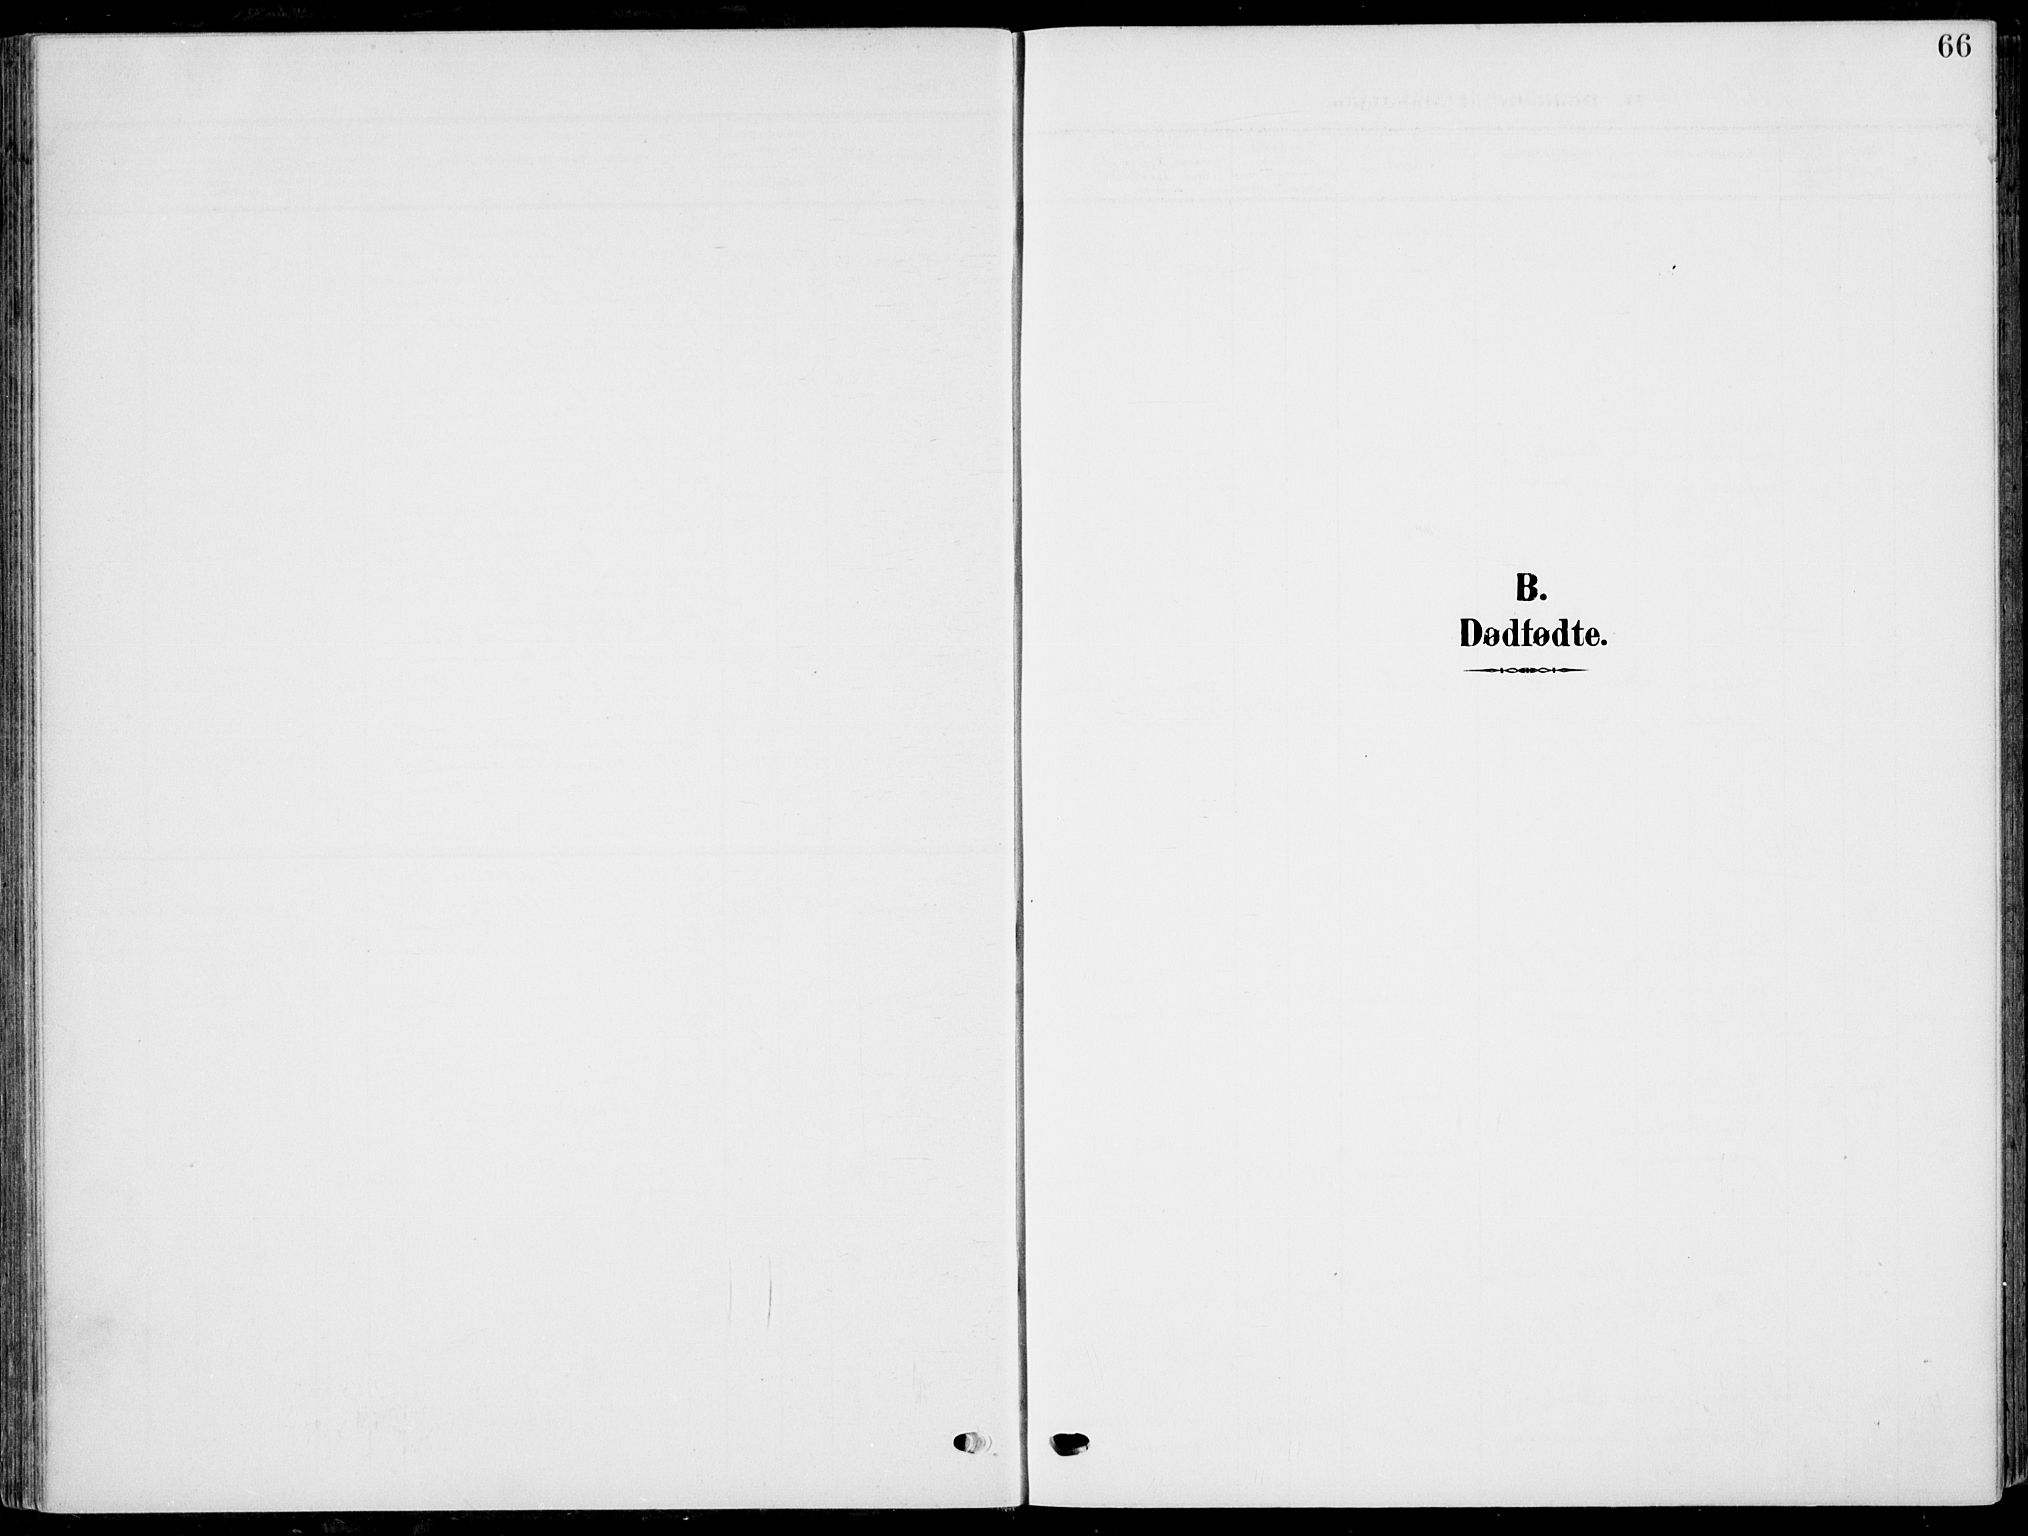 SAKO, Hole kirkebøker, F/Fa/L0010: Ministerialbok nr. I 10, 1907-1917, s. 66